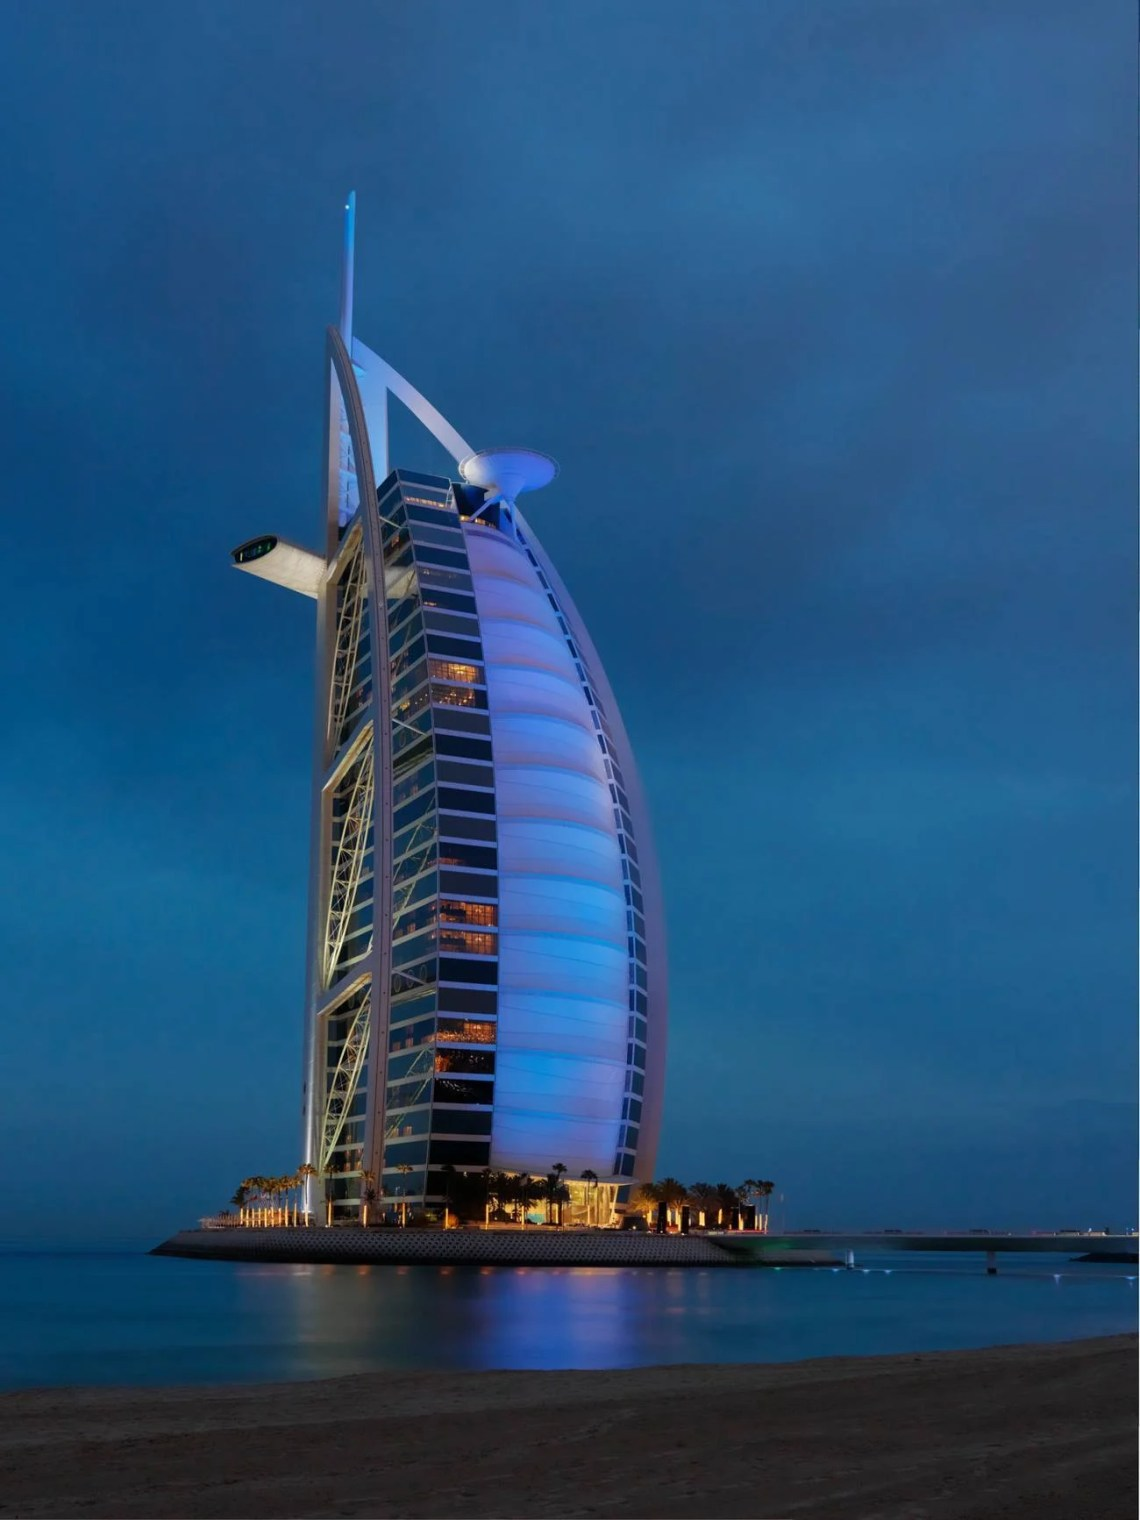 10 Bucket List Hotels And Resorts Around The World